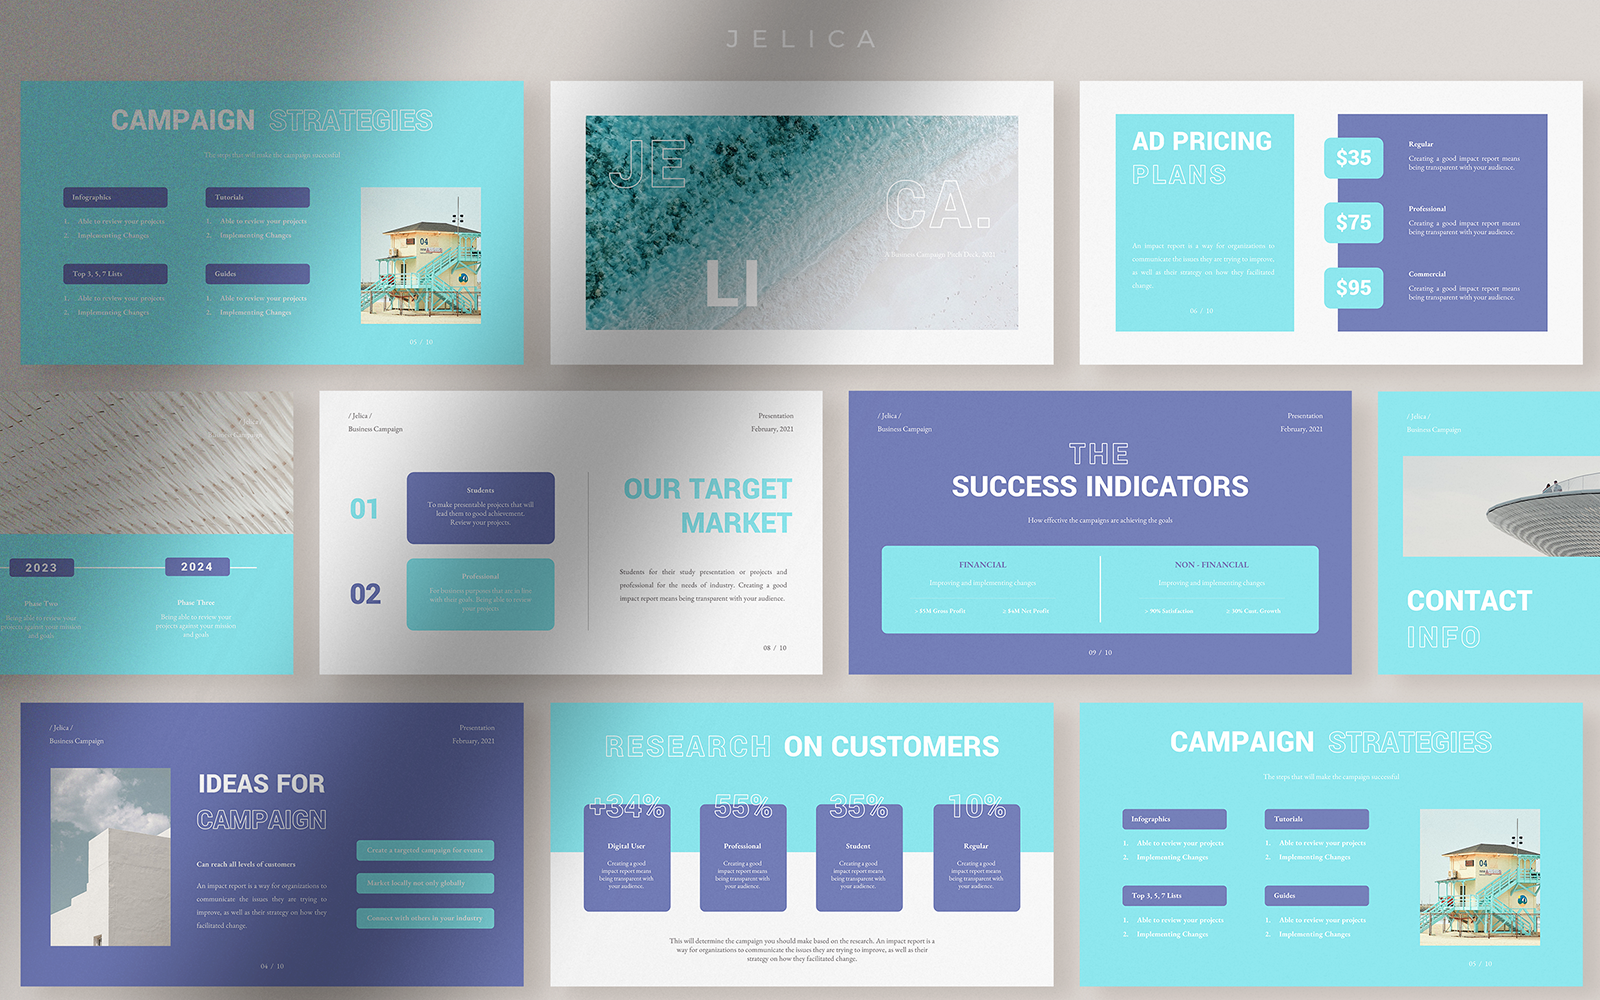 Jelica - Aquatic Modern Business Campaign Presentation PowerPoint Template